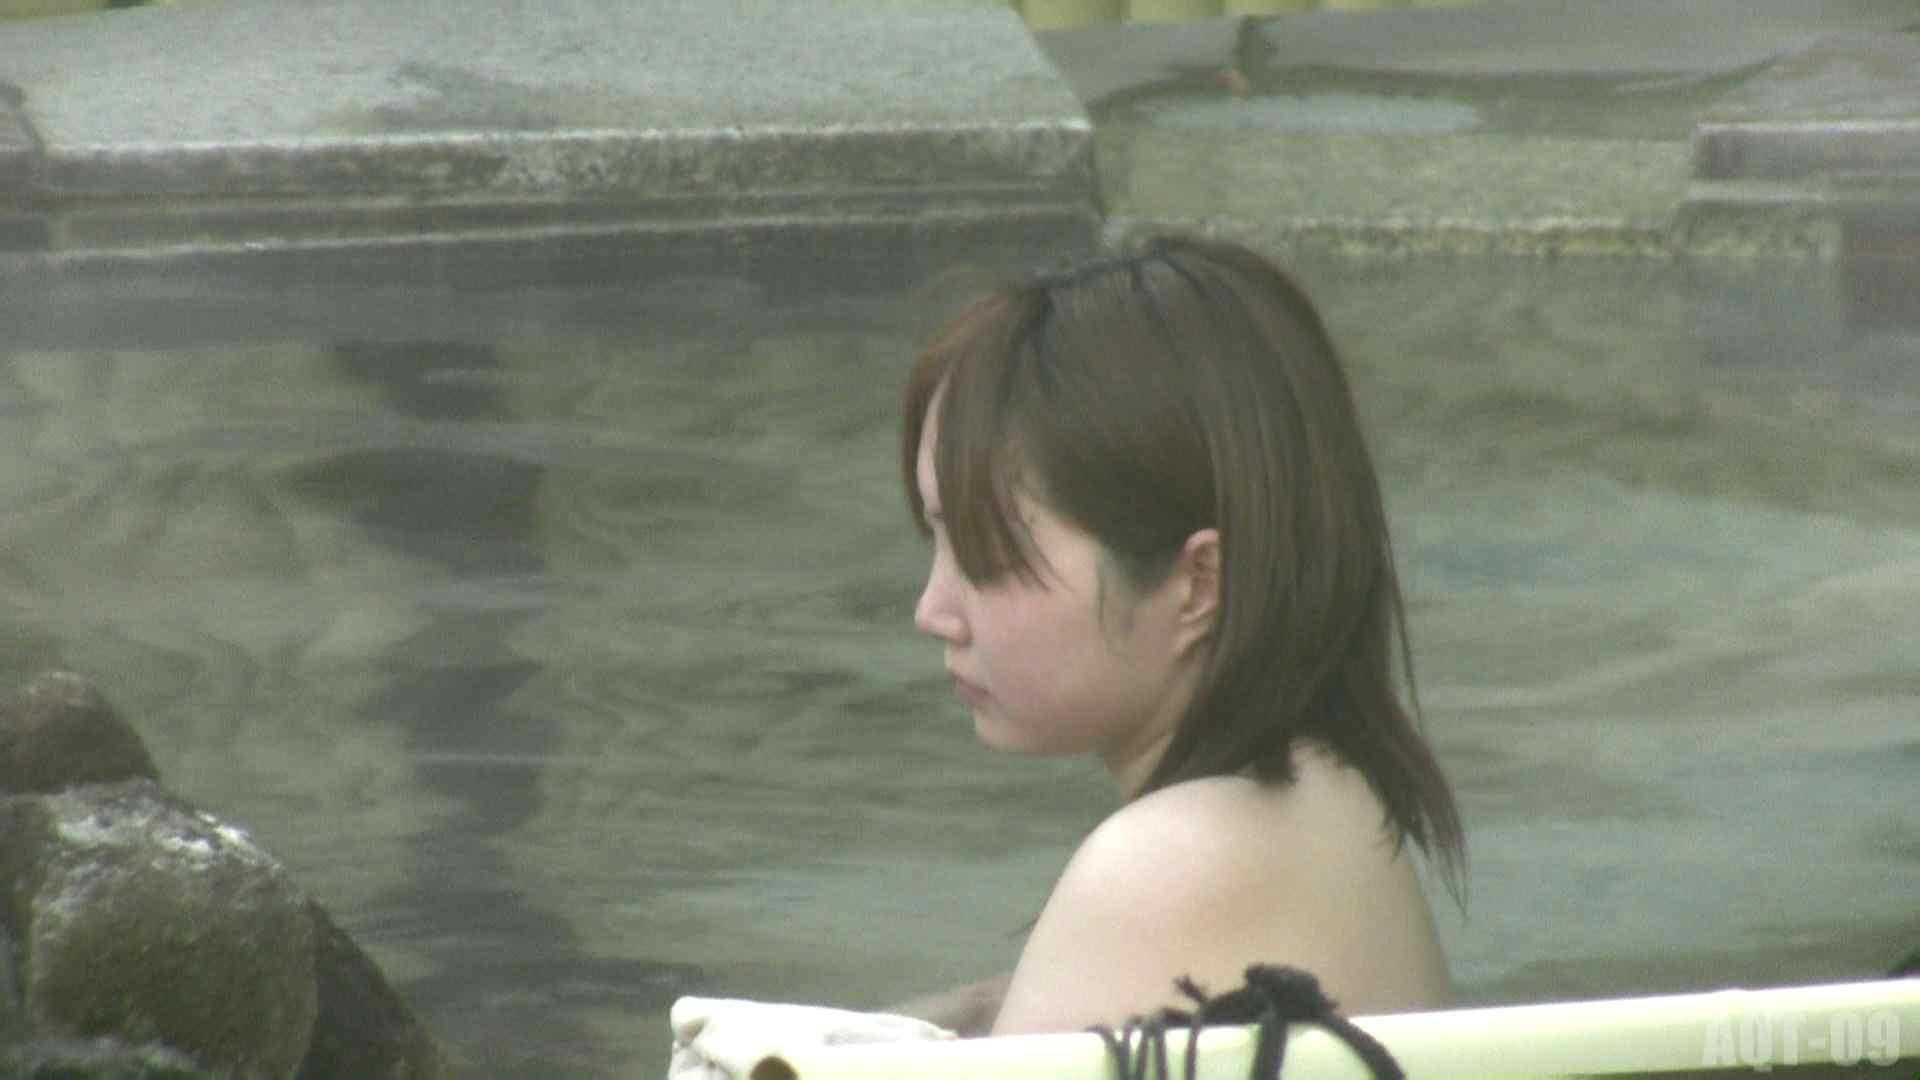 Aquaな露天風呂Vol.781 0  48連発 18